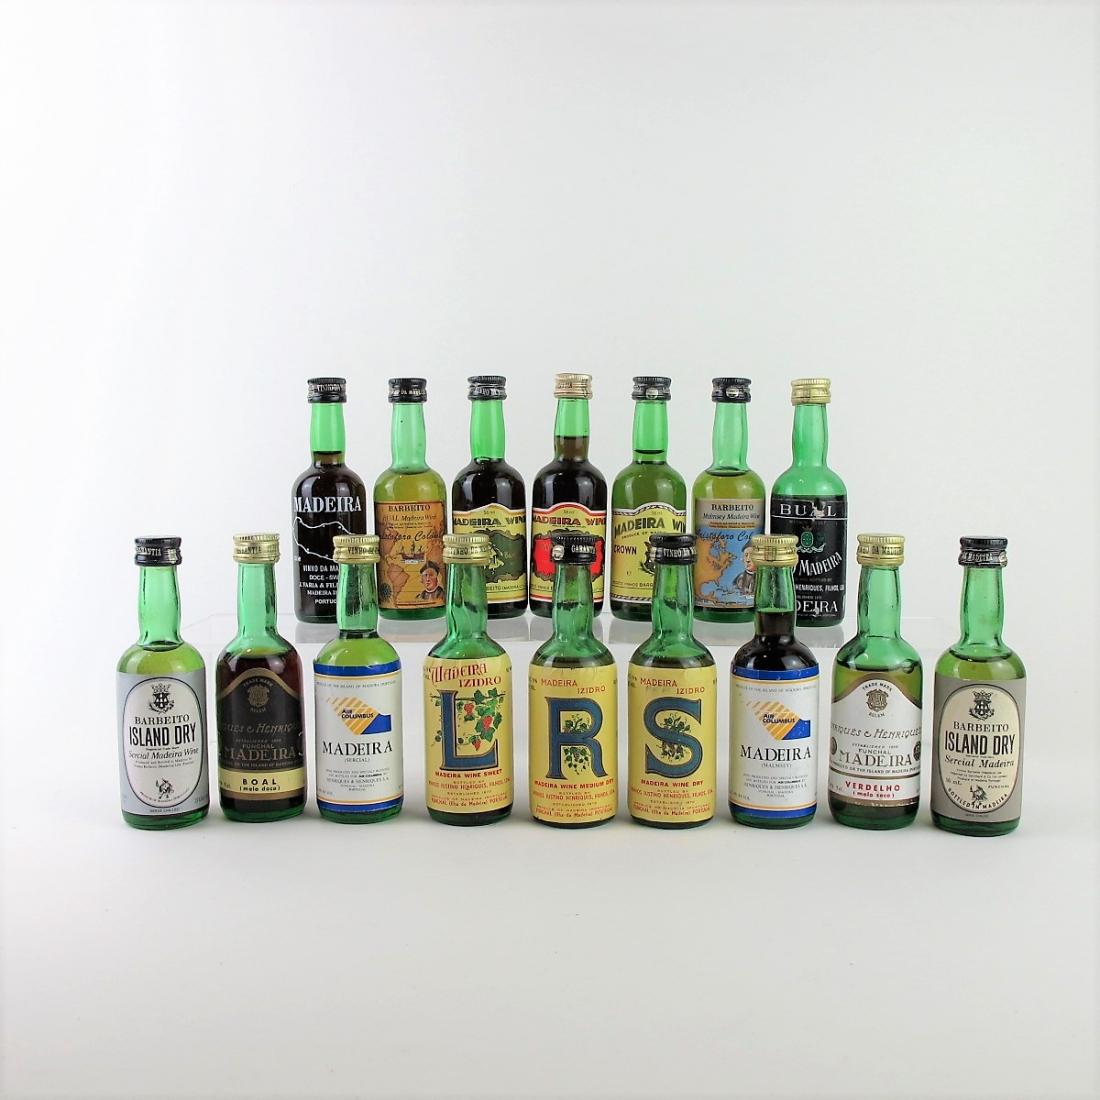 Selection of Madeira Miniatures 16x5cl